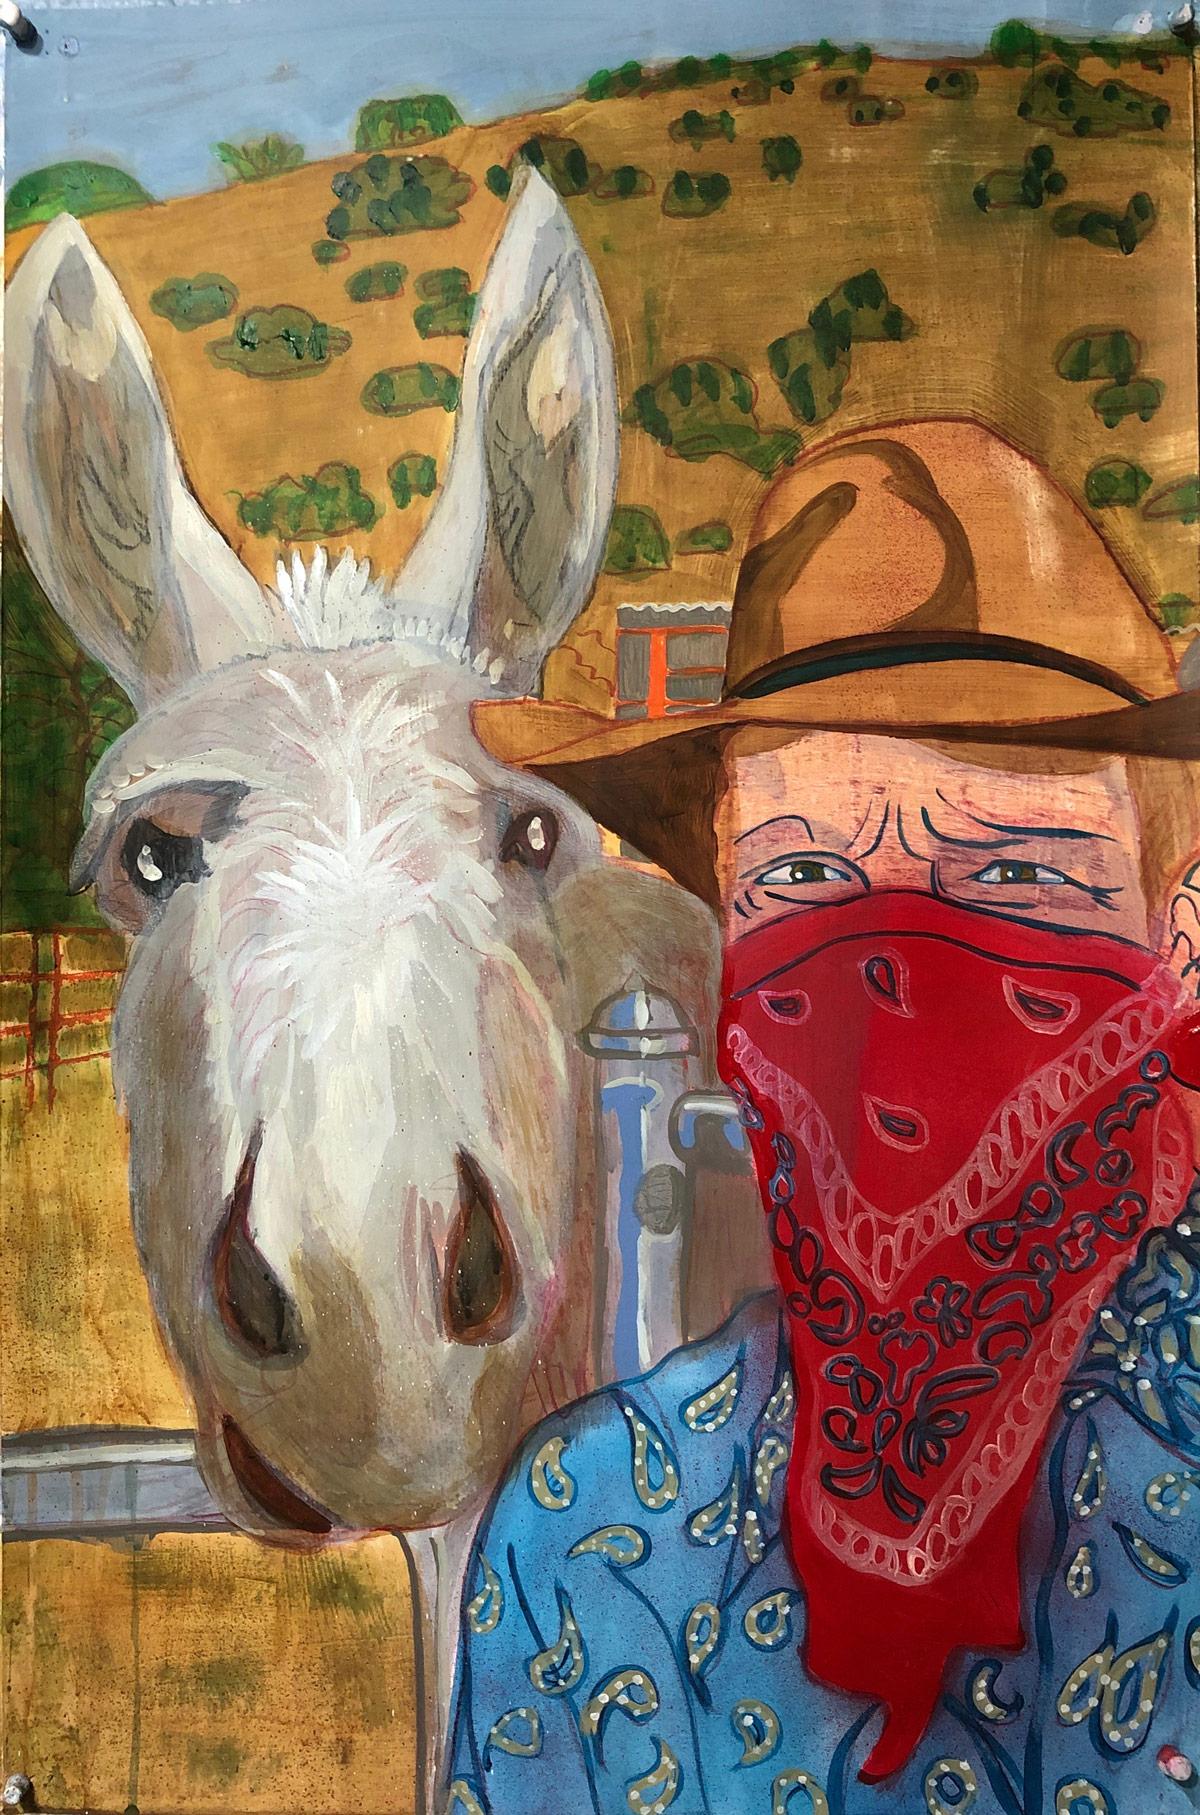 Mike Randal, Mule wrangler, environmentalist, 2020